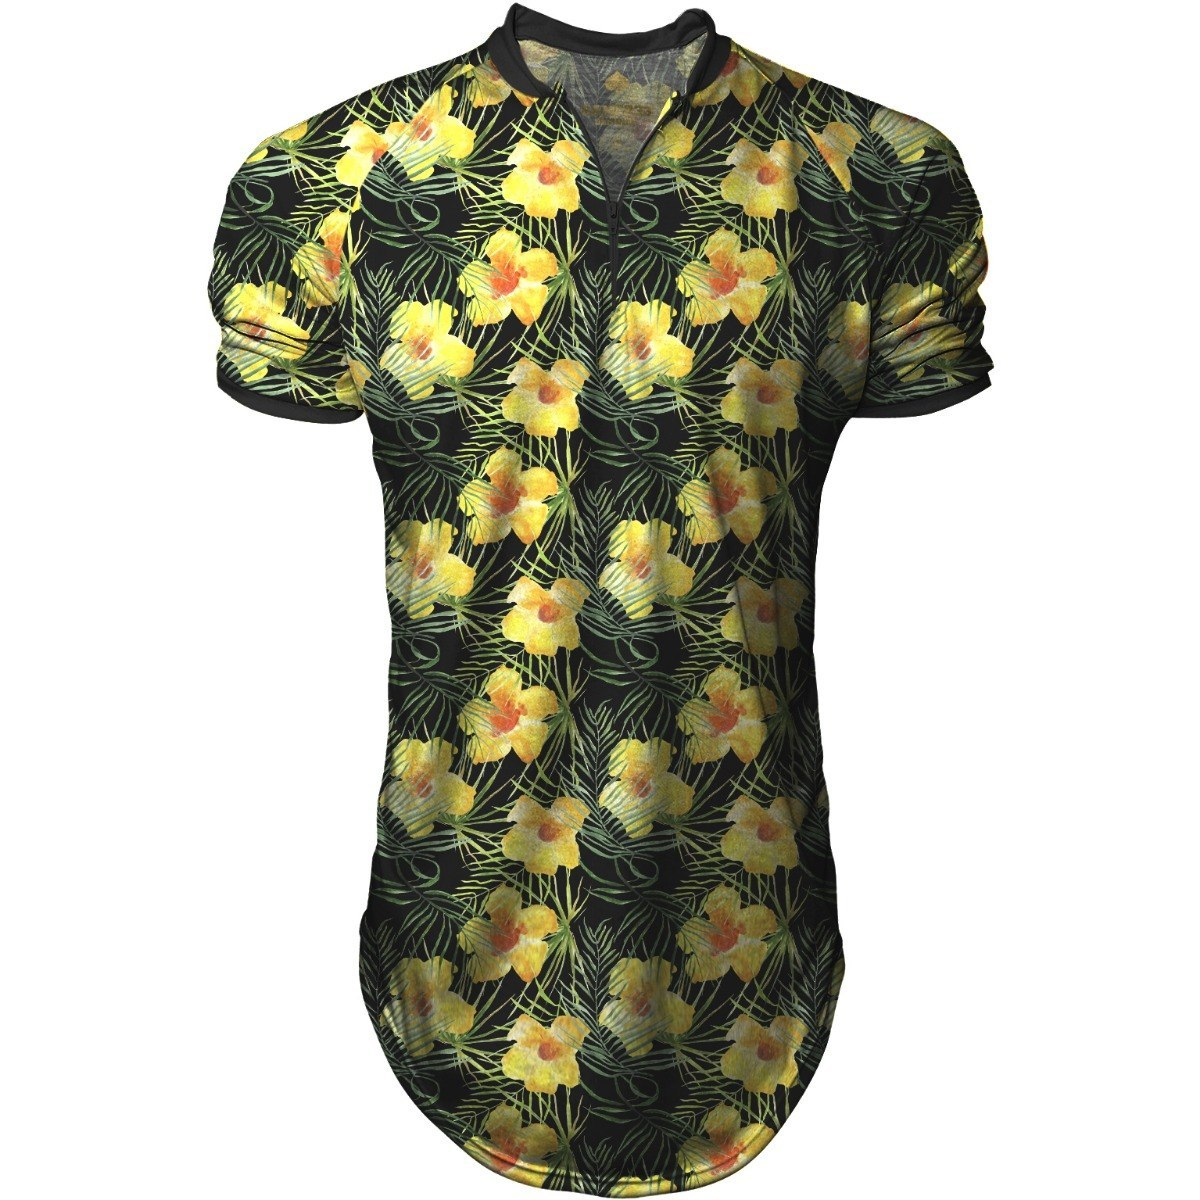 camisa longline masculina gola polo esporte margaridas. Carregando zoom. dacdffe2a7ab6